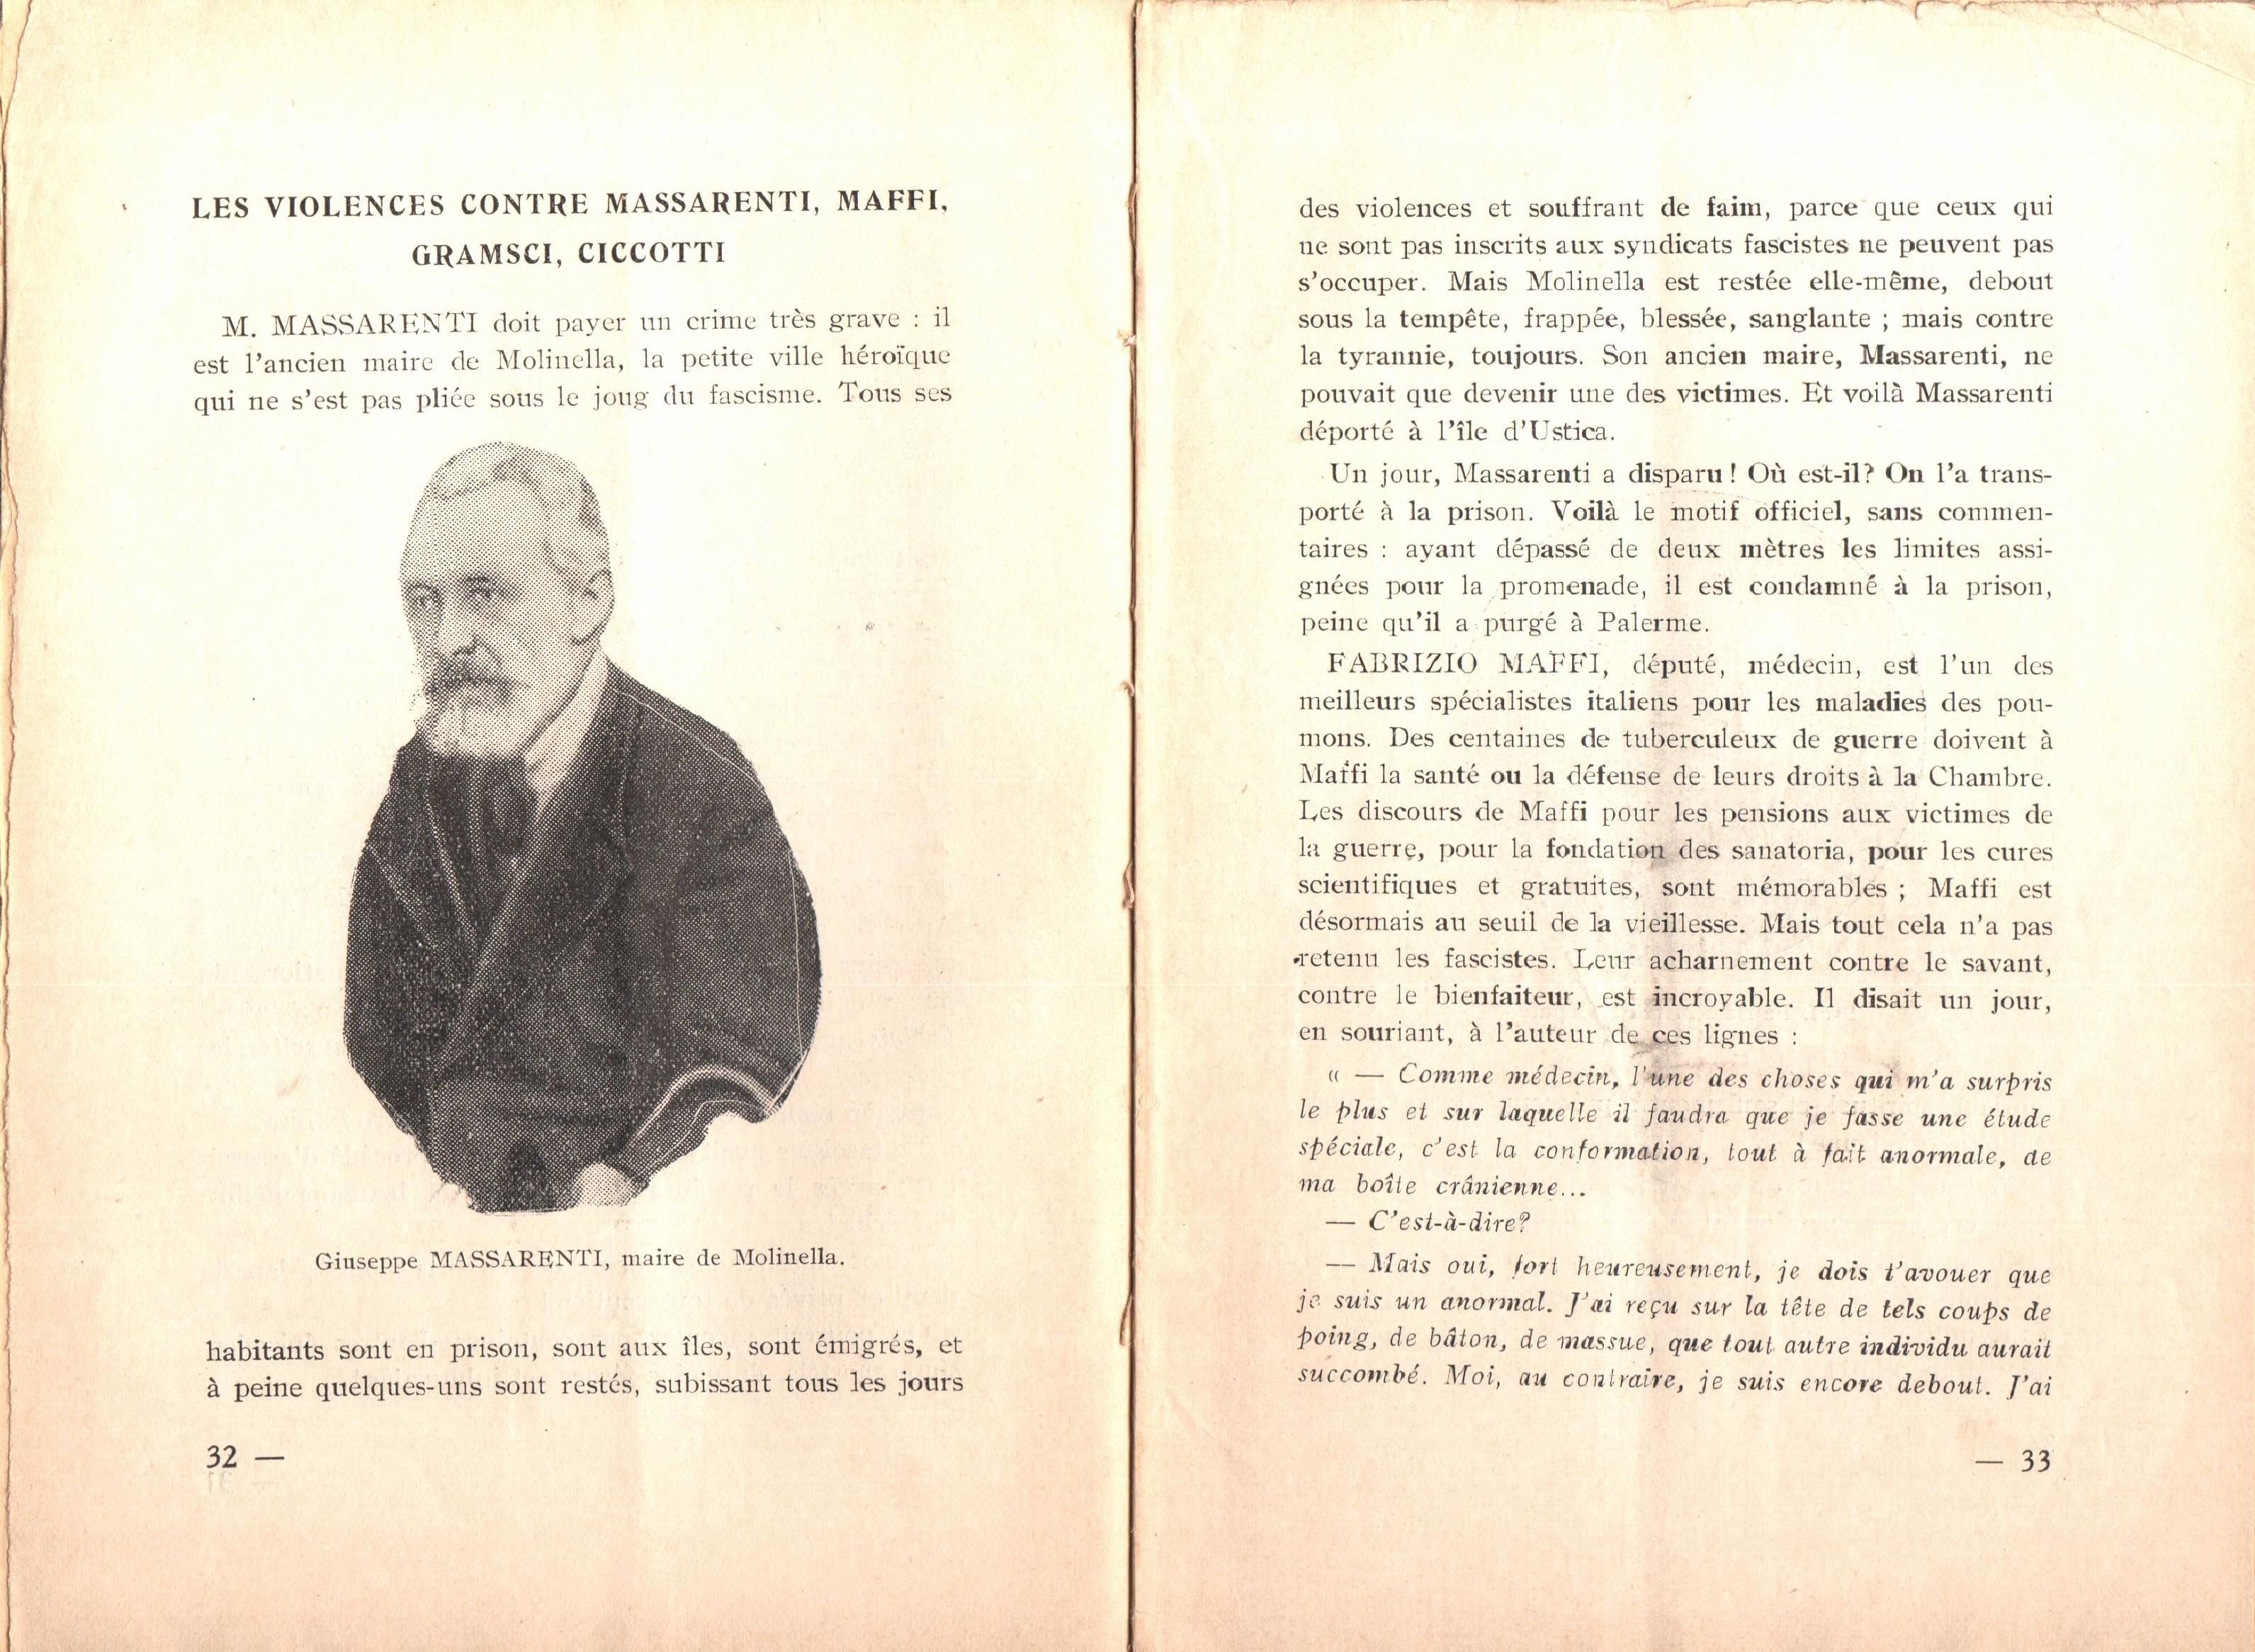 Nicola Cilla, Les «Cayennes» d'Italie - pag. 18